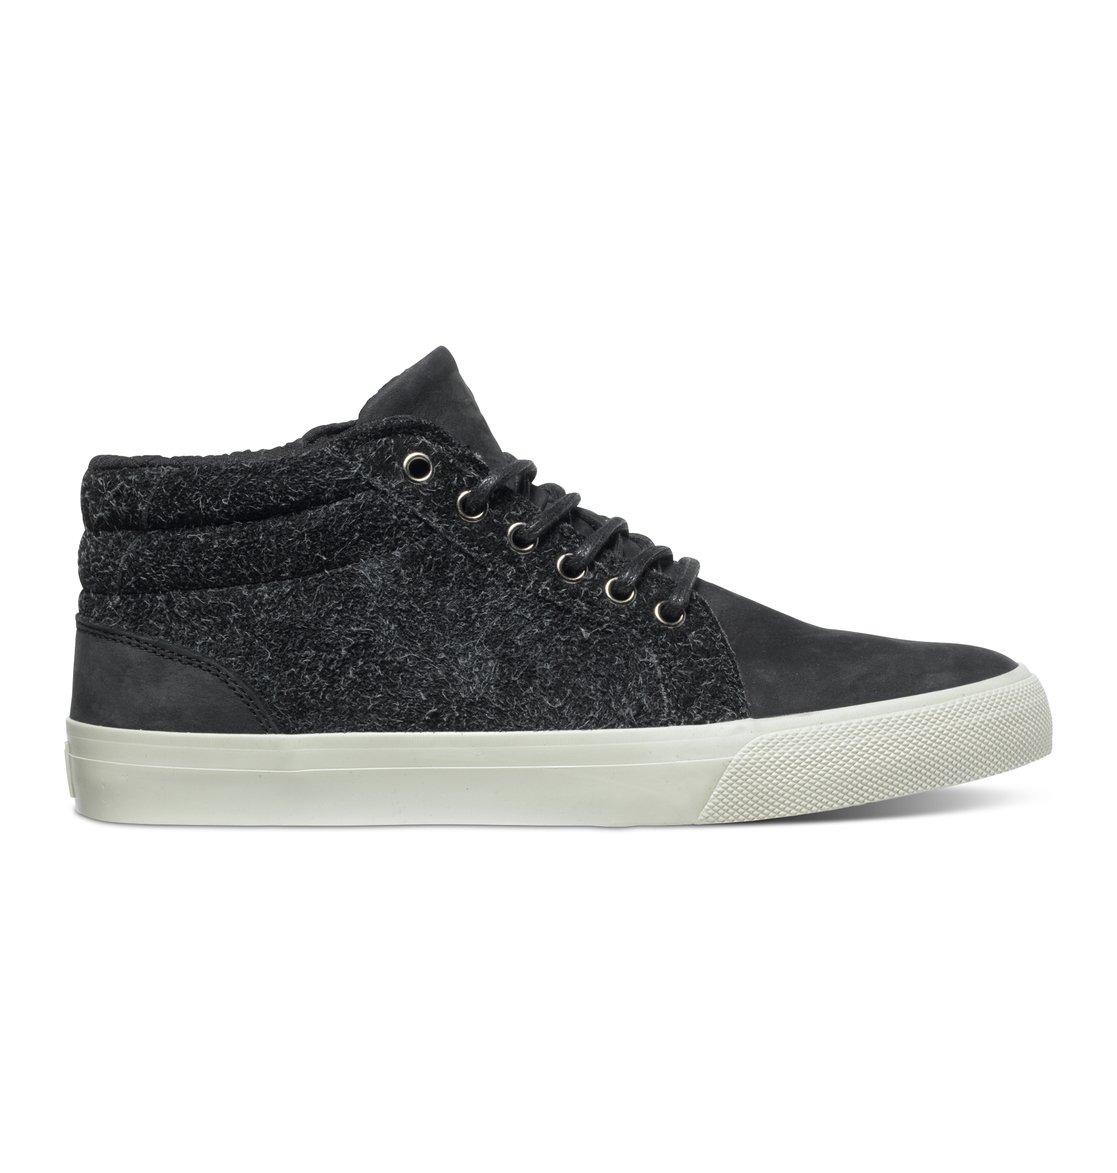 616966e324e1 0 Council LX Mid Top Shoes ADYS300258 DC Shoes